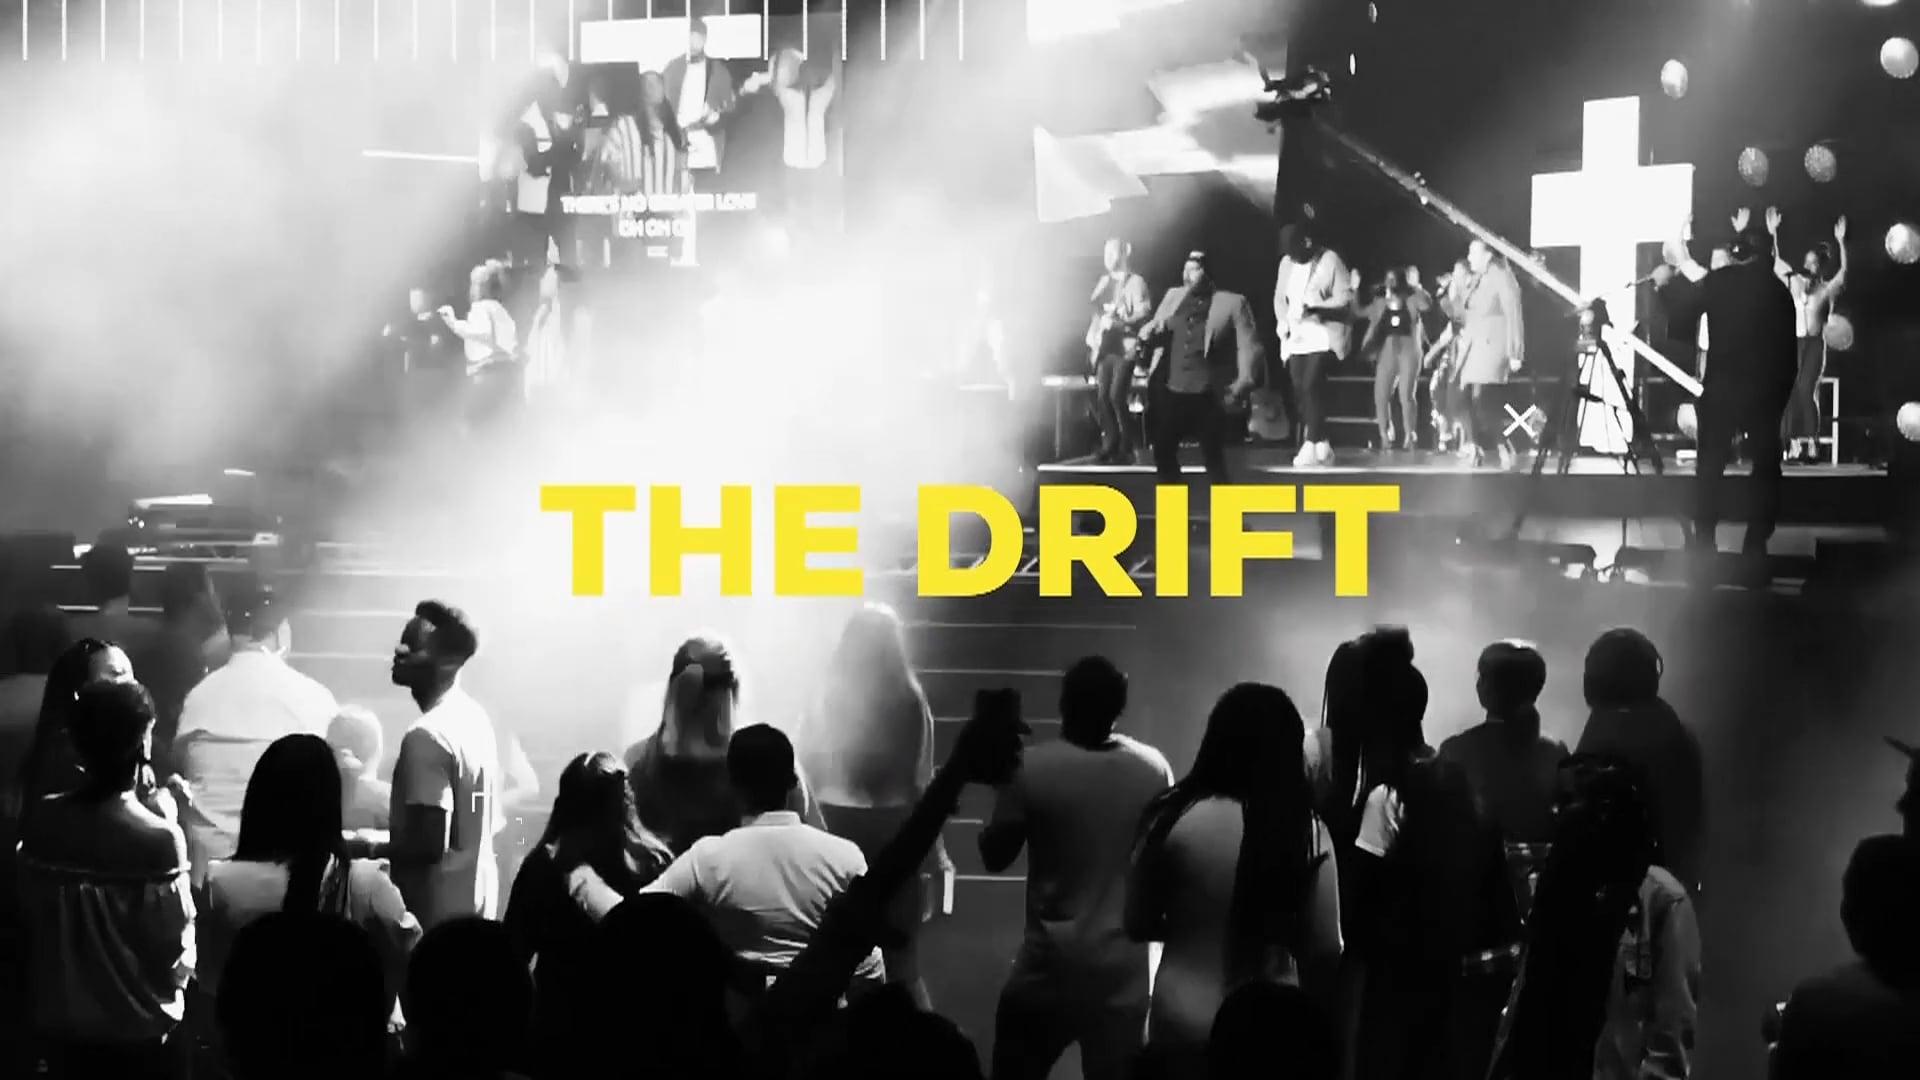 THE DRIFT   Glory   27th January 2019